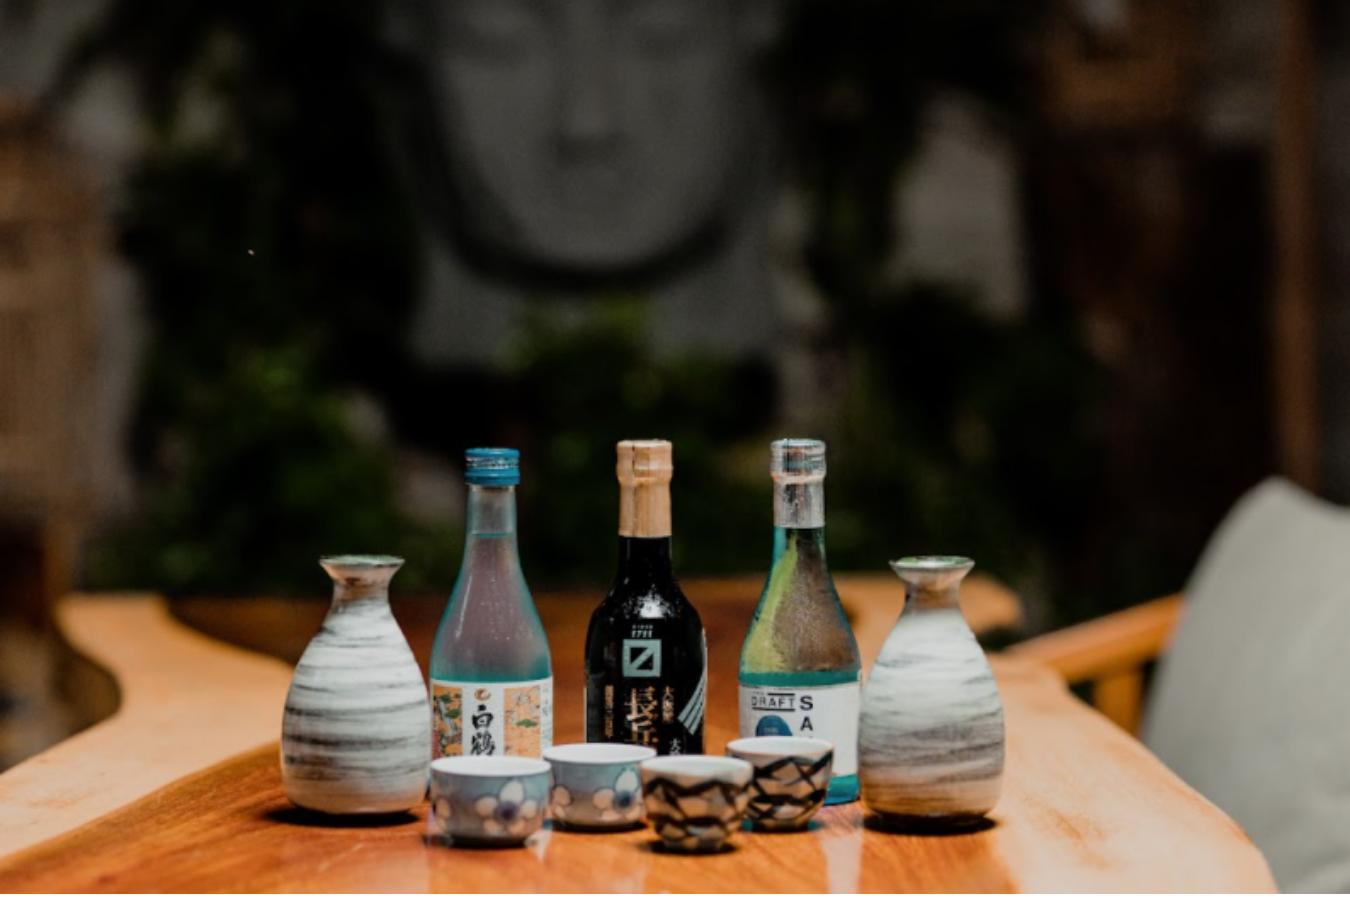 restaurante comida japonesa, sake